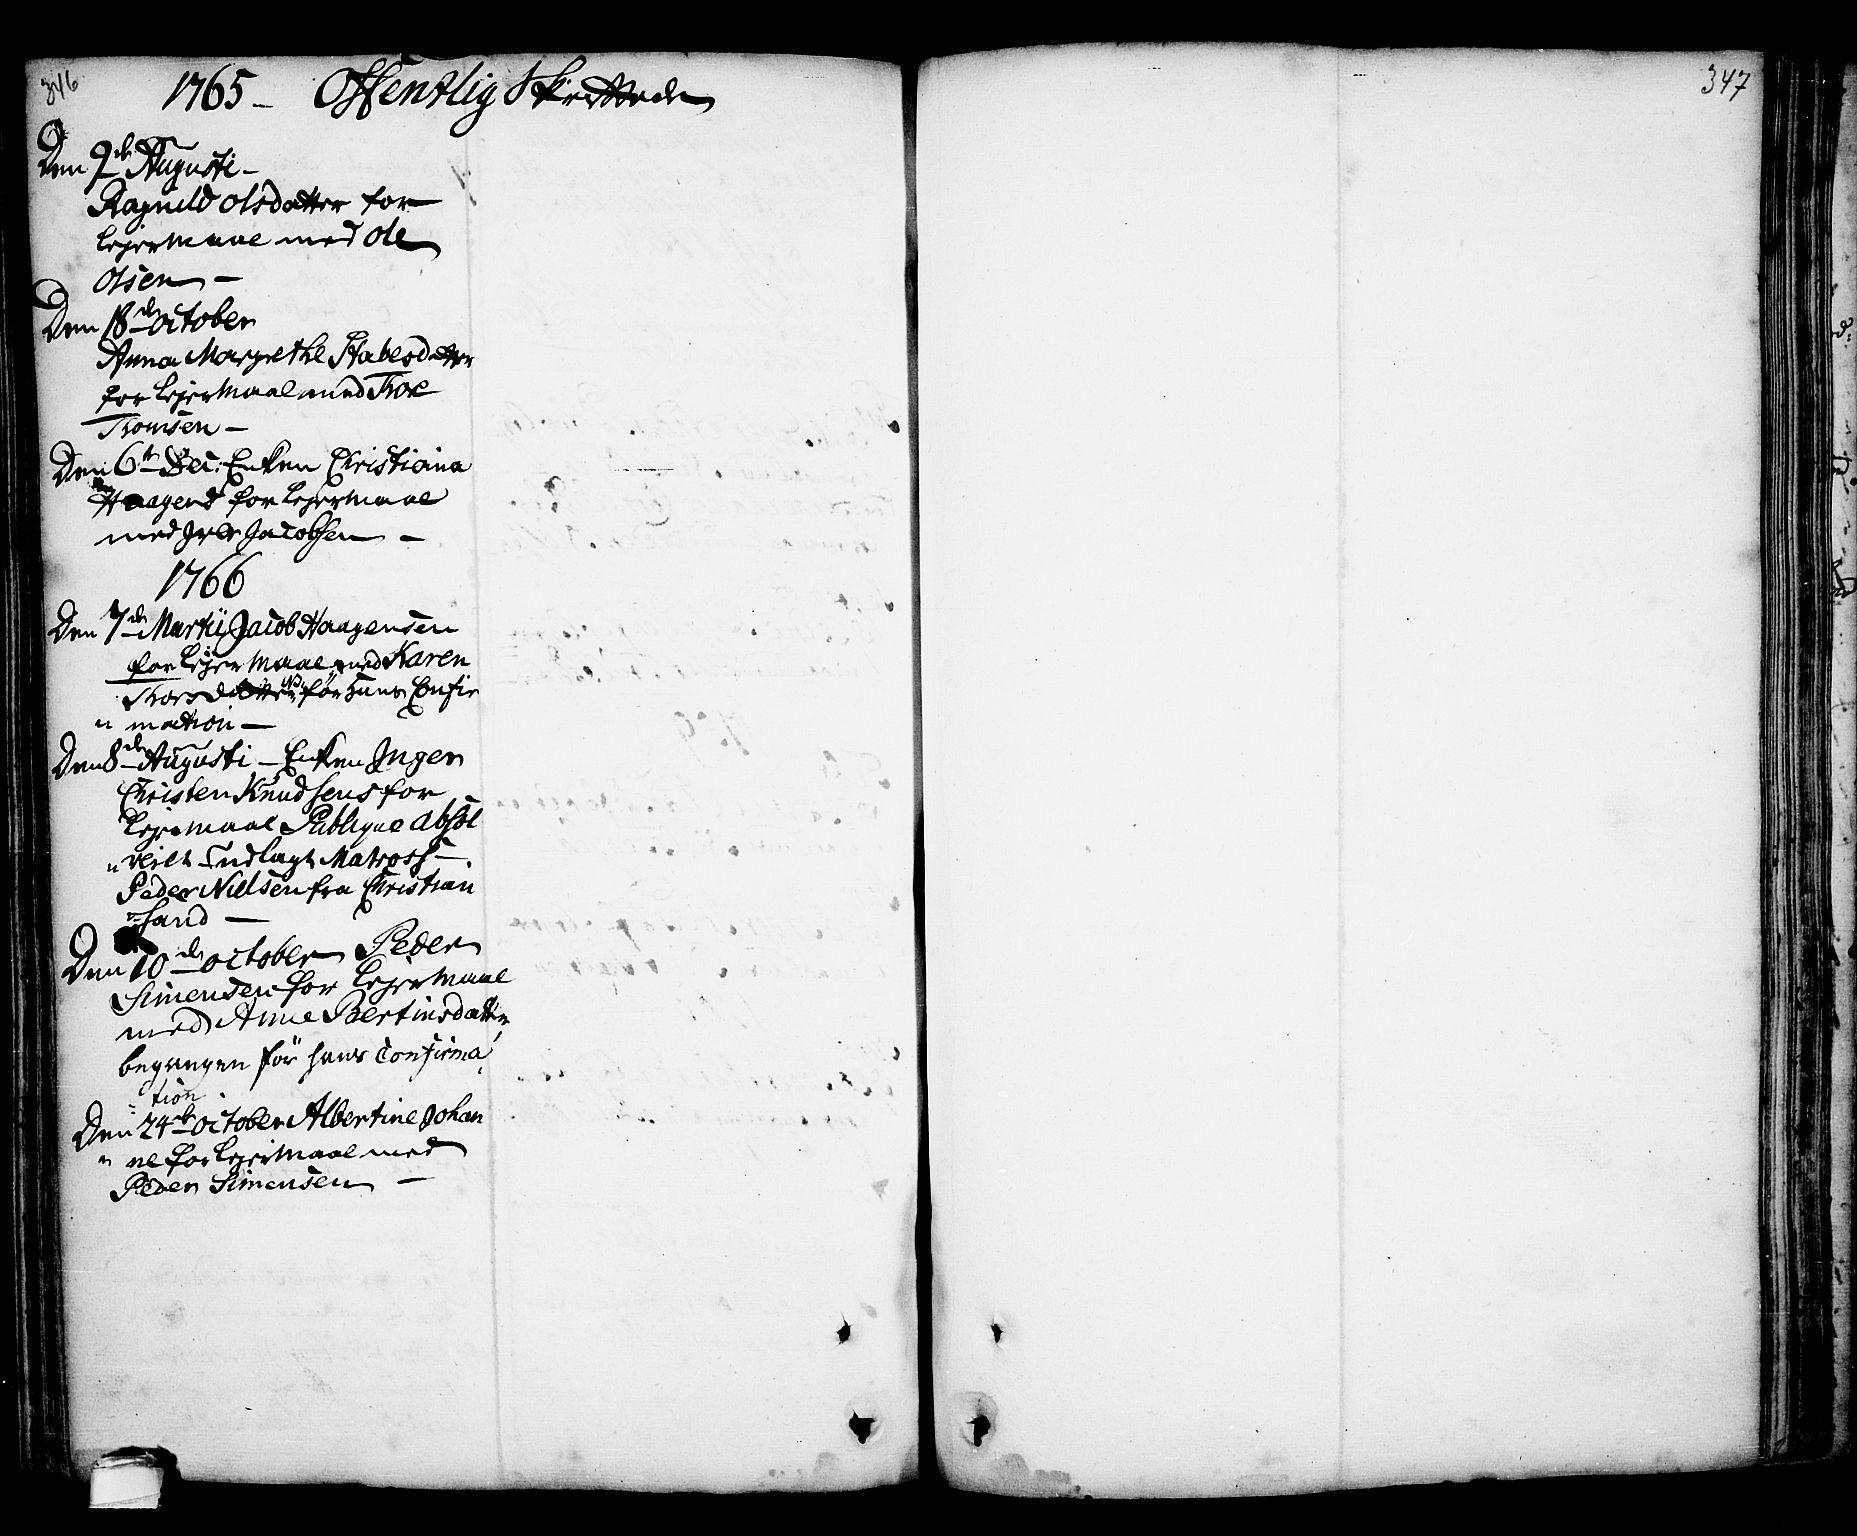 SAKO, Kragerø kirkebøker, F/Fa/L0001: Ministerialbok nr. 1, 1702-1766, s. 346-347